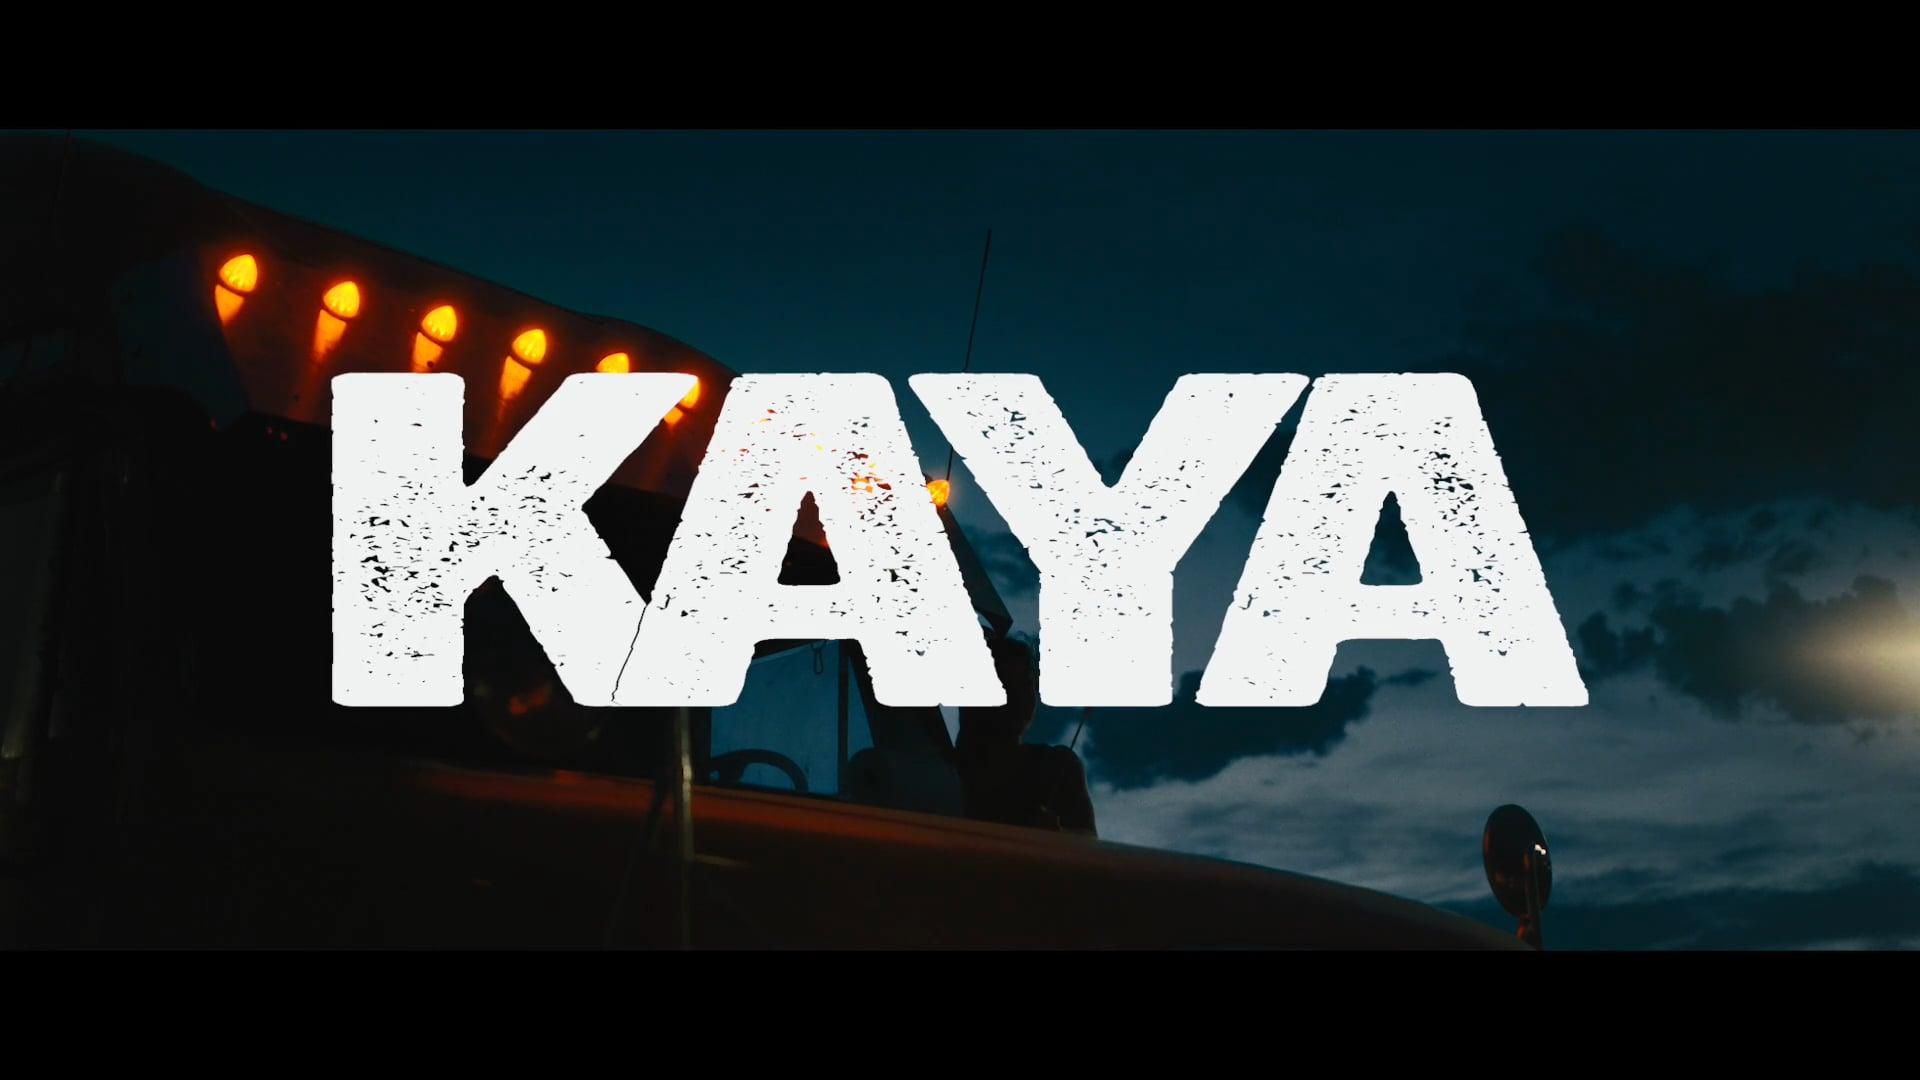 KAYA TRAILER